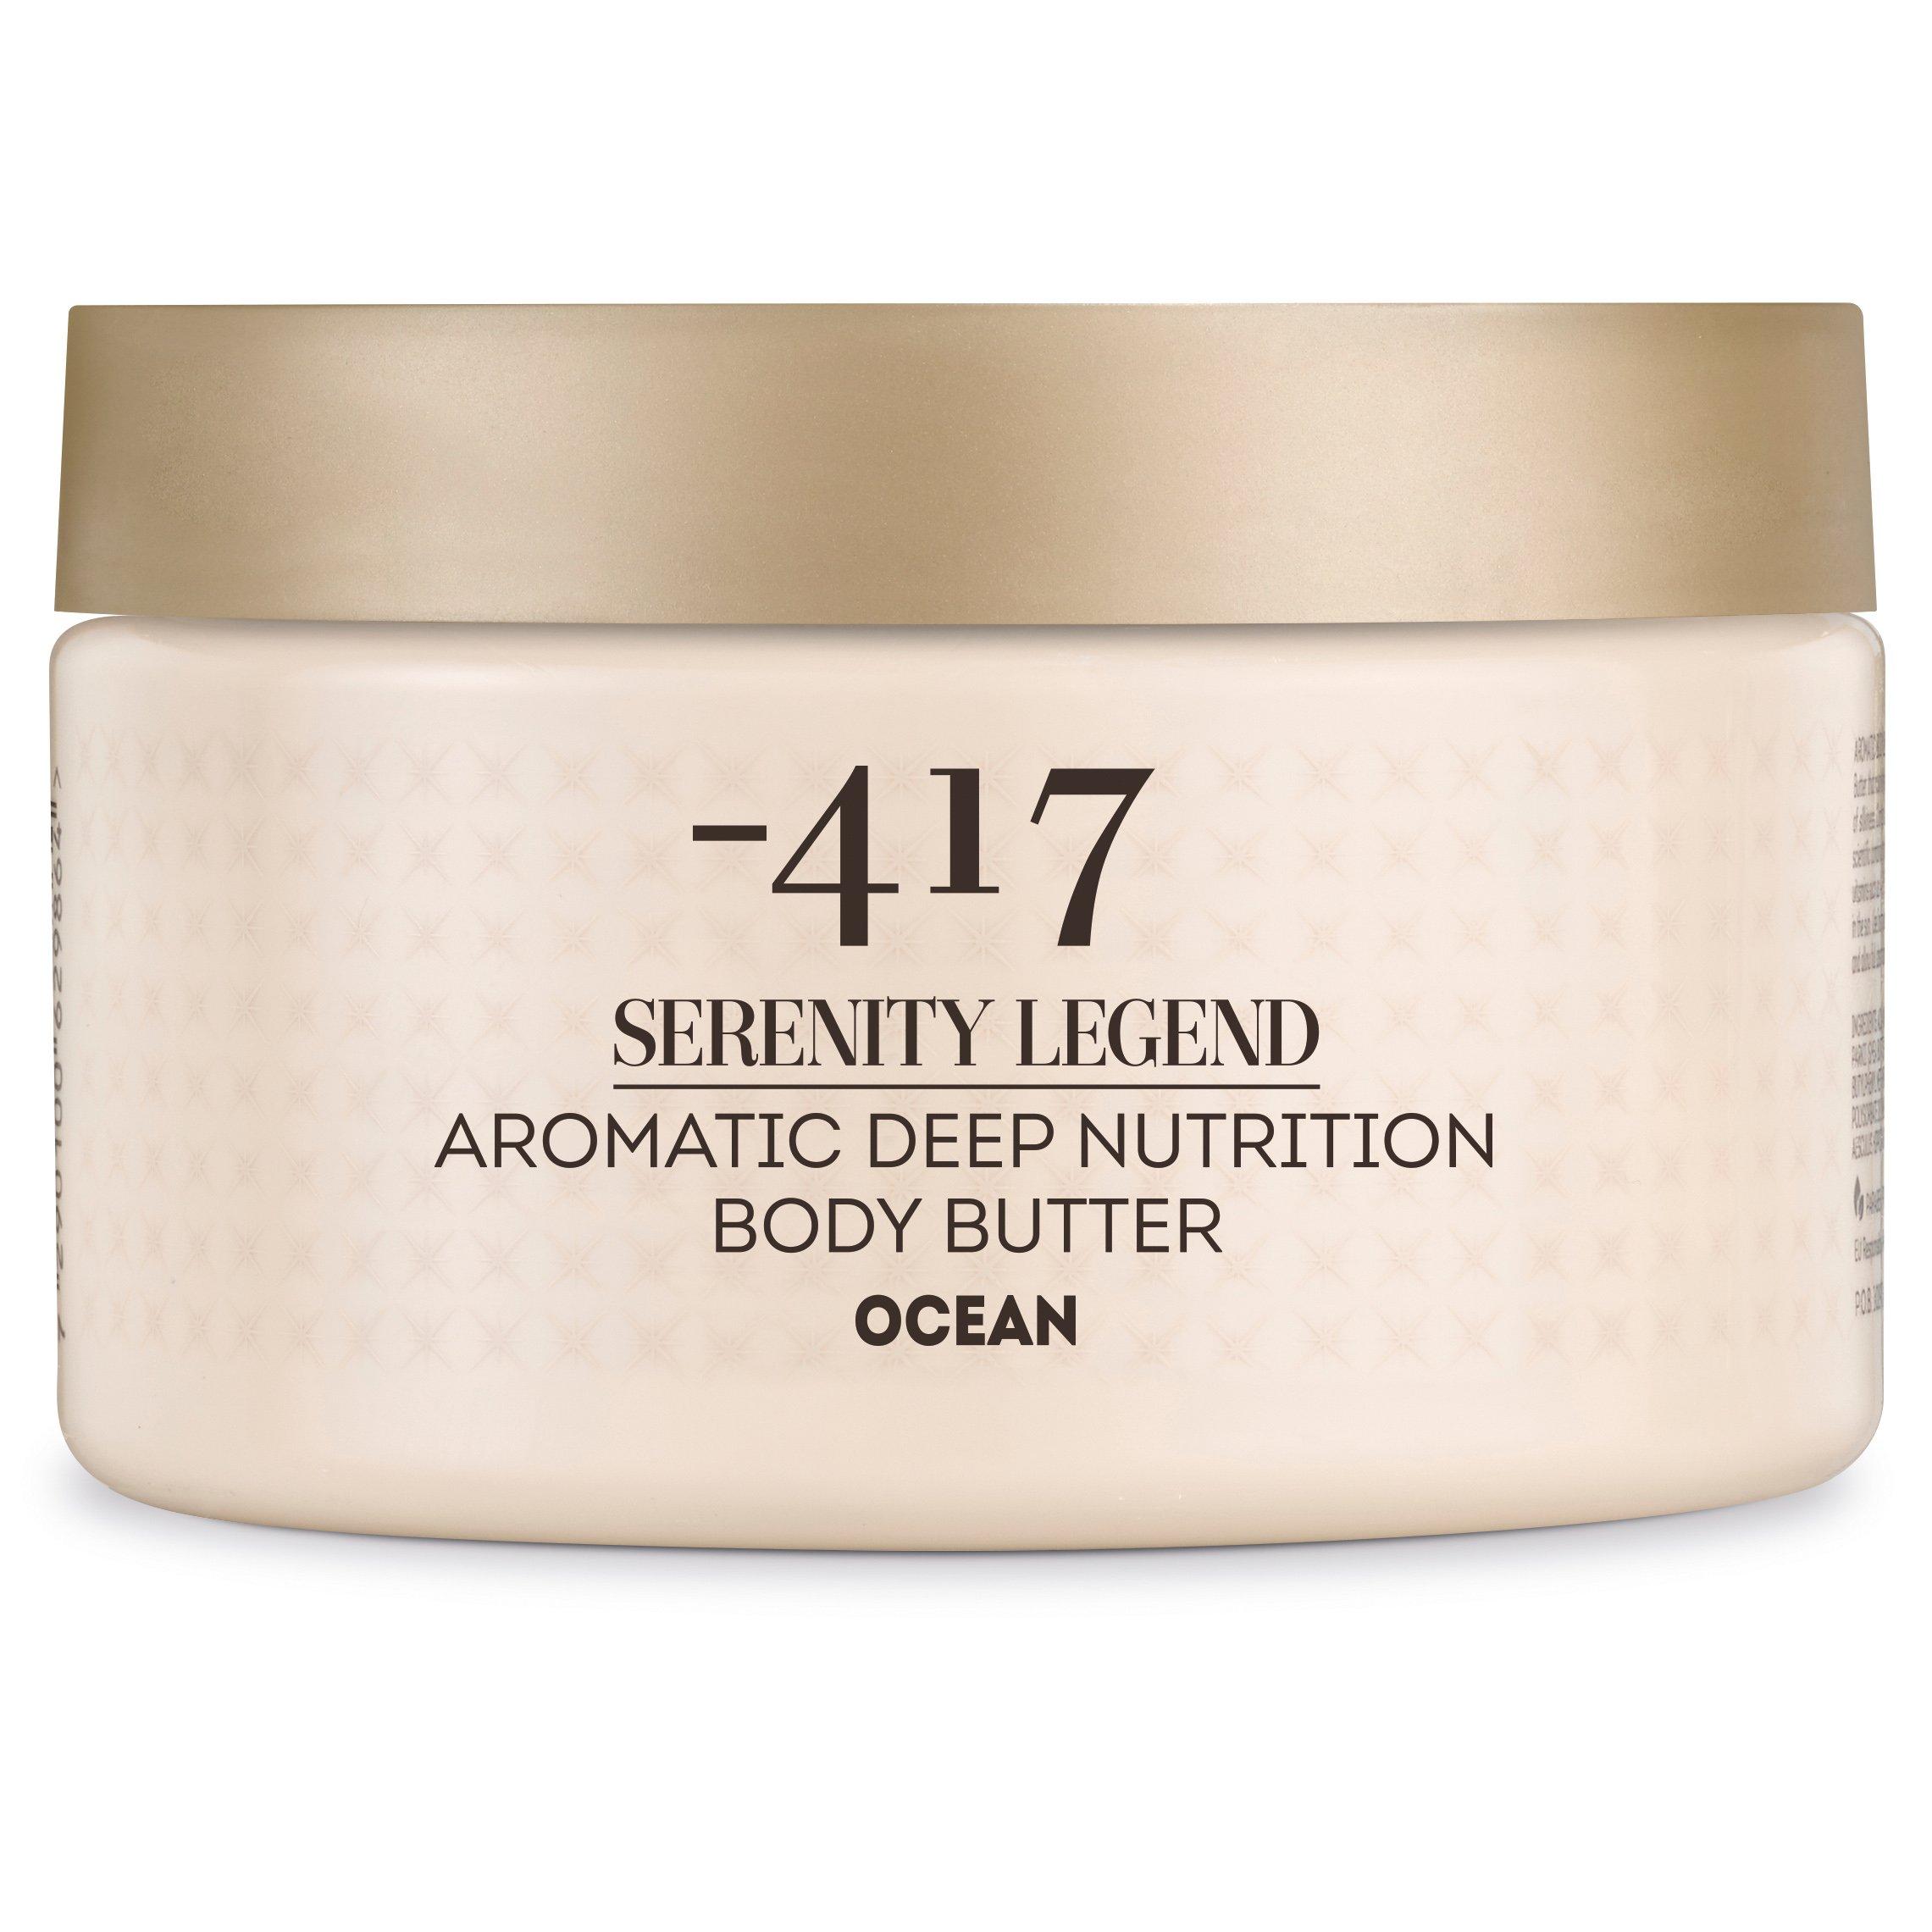 Minus 417 Serenity Legend Aromatic Deep Nutrition Body Butter Ocean Απαλή Αρωματική Πλούσια Υπερθρεπτική Κρέμα Σώματος 250ml